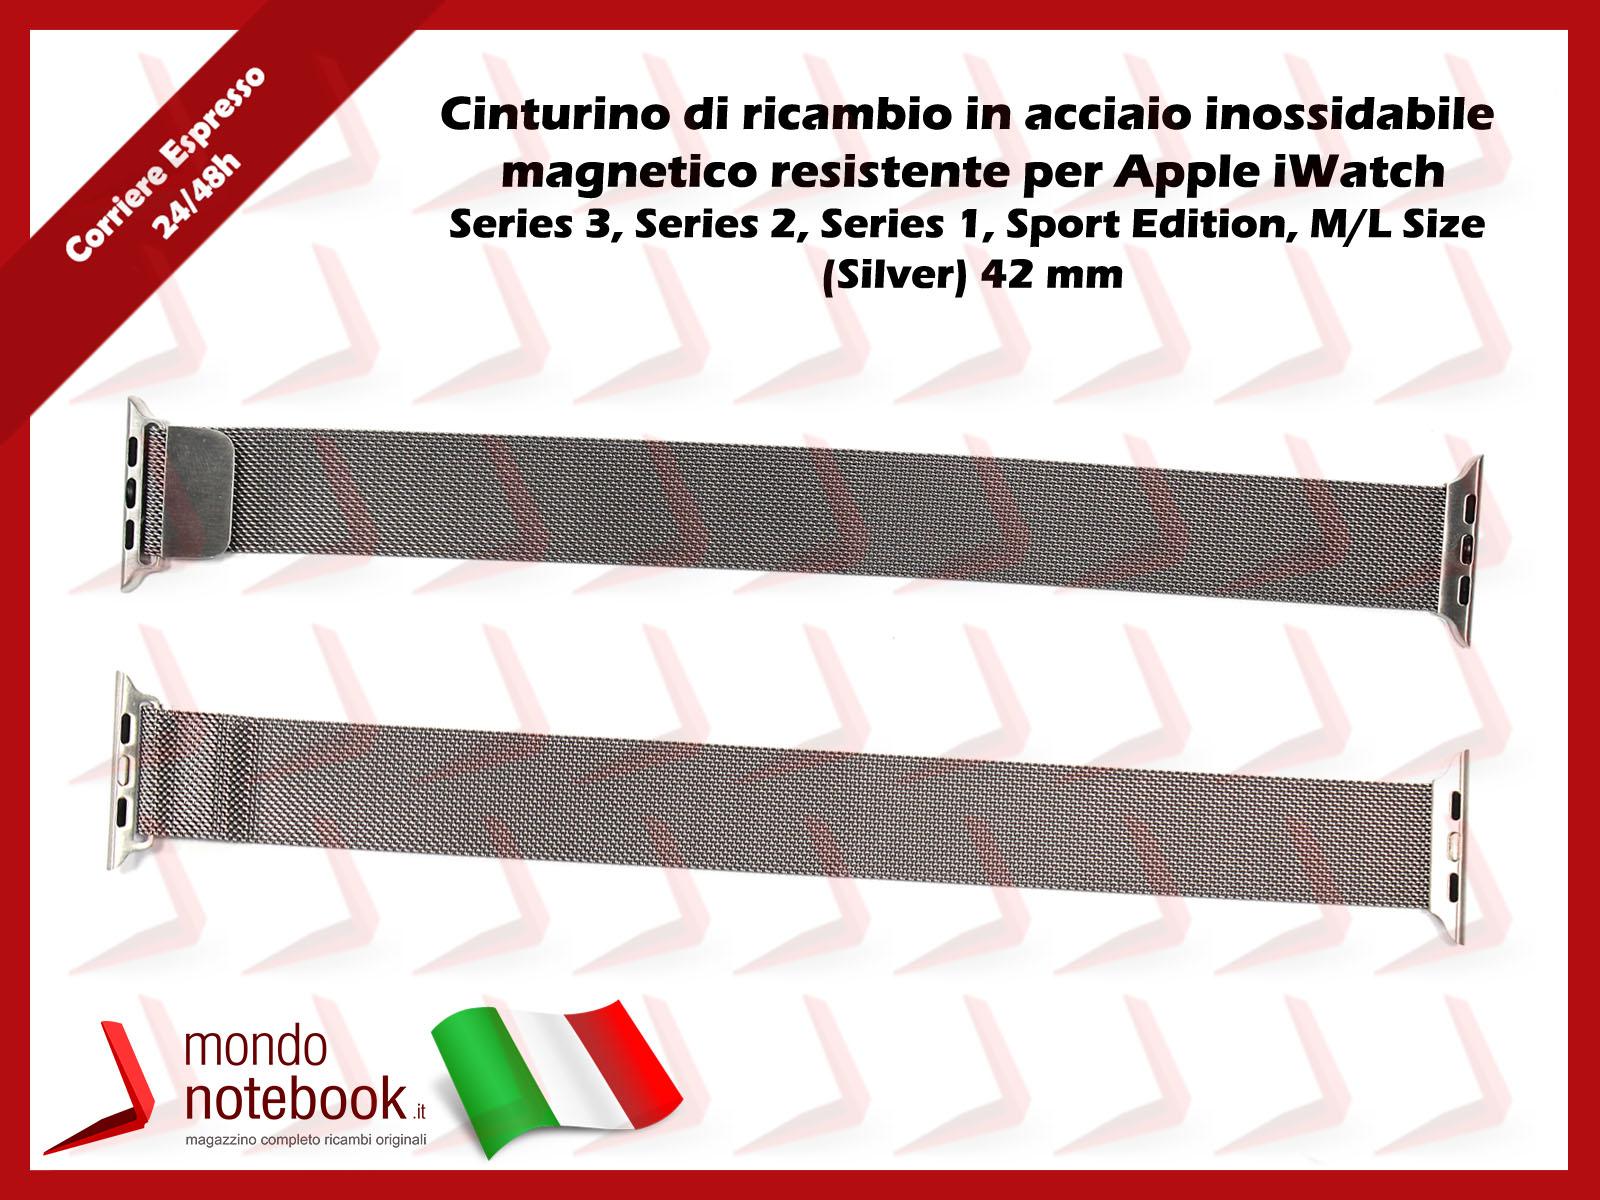 https://www.mondonotebook.it/6646/cinturino-per-apple-iwatch-in-acciaio-inossidabile-magnetico-series-3-series-2-series-1-sport-edition-m-l-size-silver-4.jpg